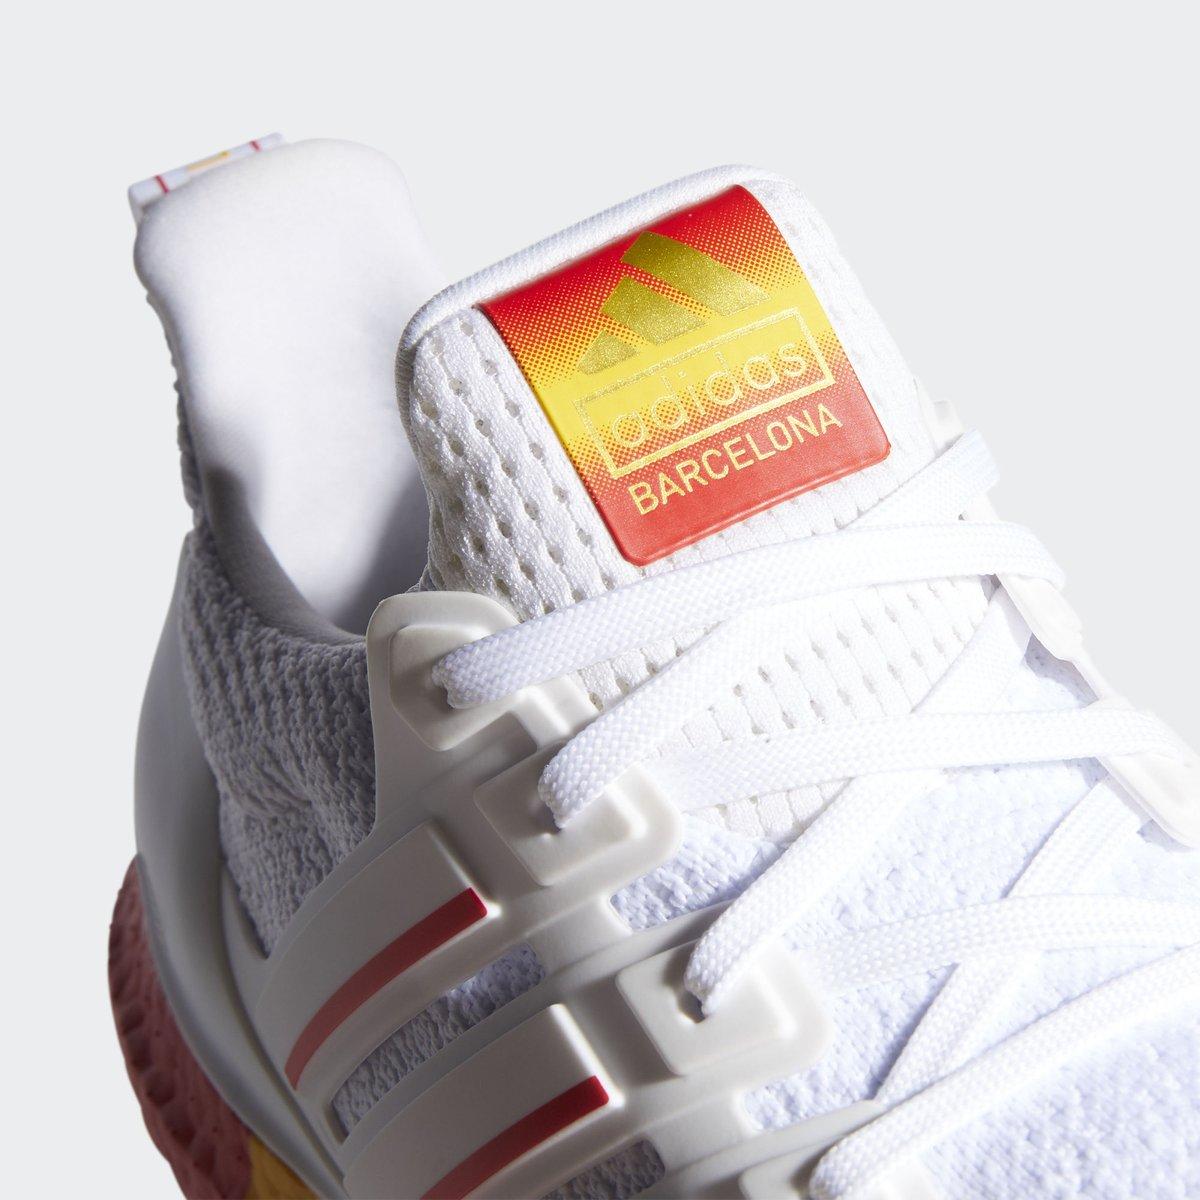 RT @Nedicks: Adidas lanza las